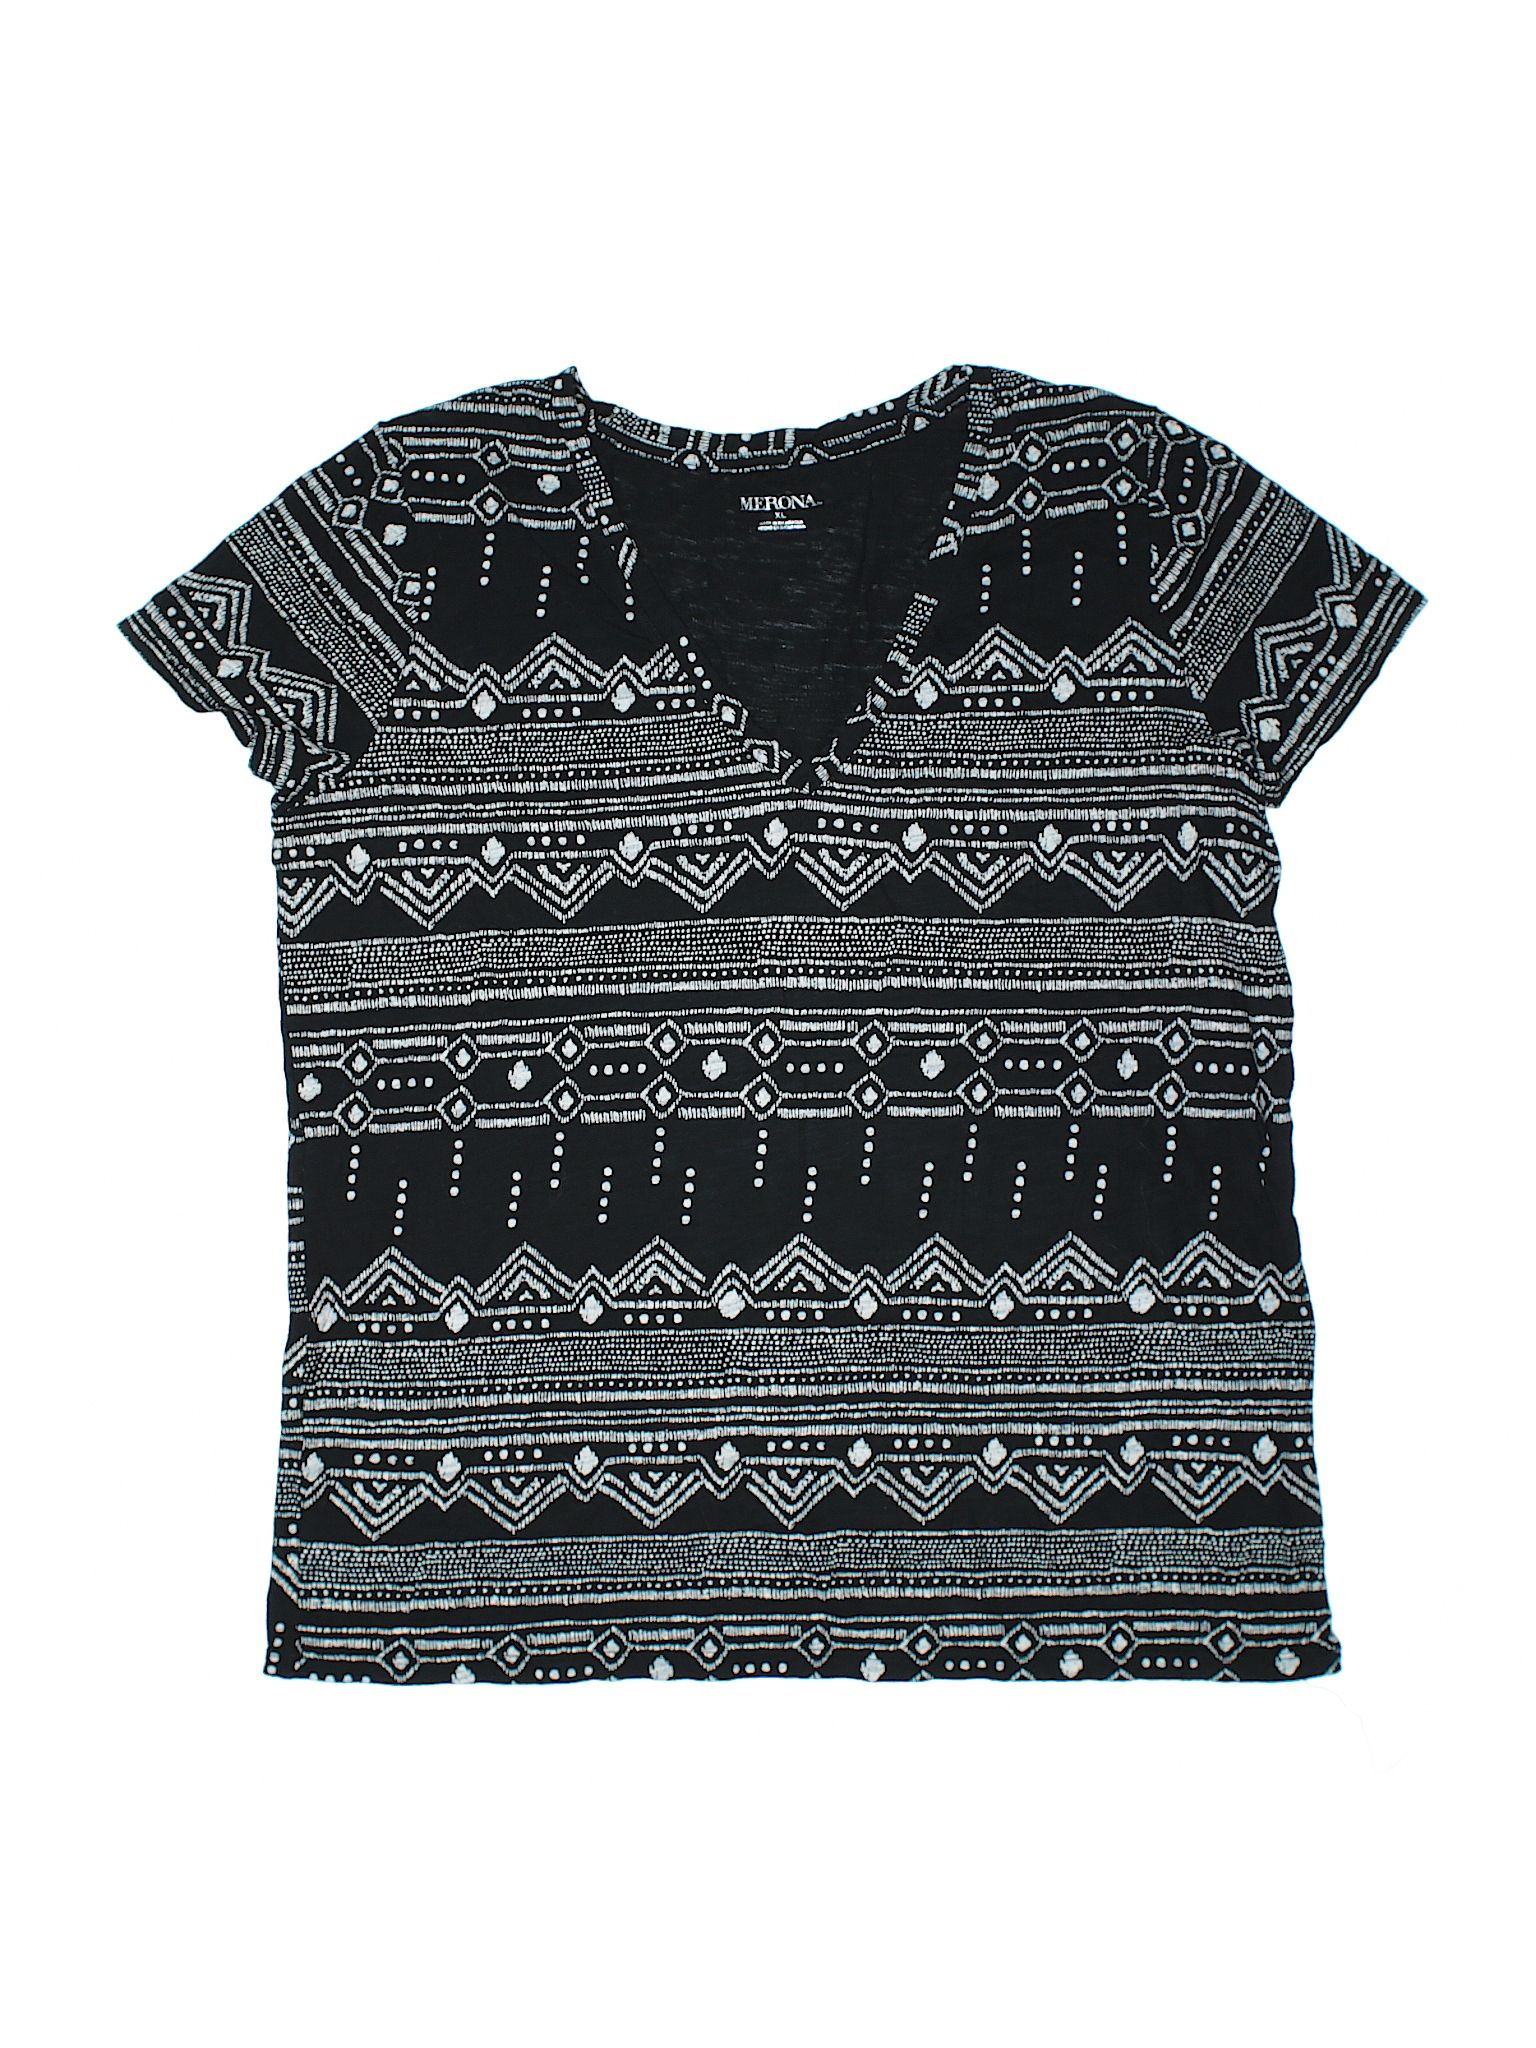 Merona Short Sleeve T Shirt Size 1200 Black Womens Tops